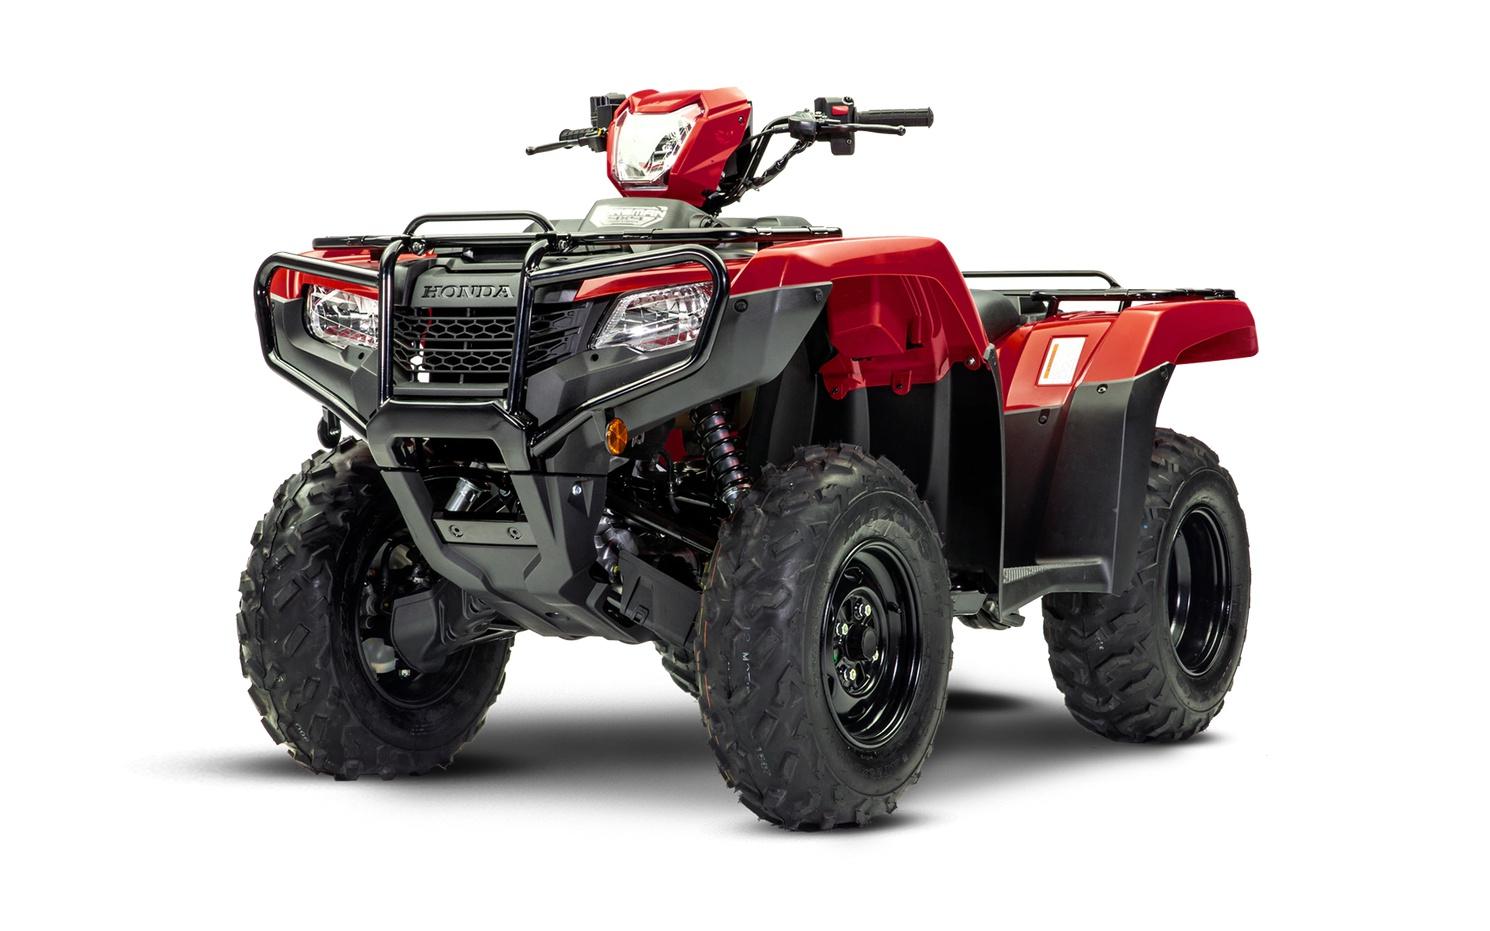 2022 Honda TRX520 Foreman ES EPS Frais inclus+Taxes